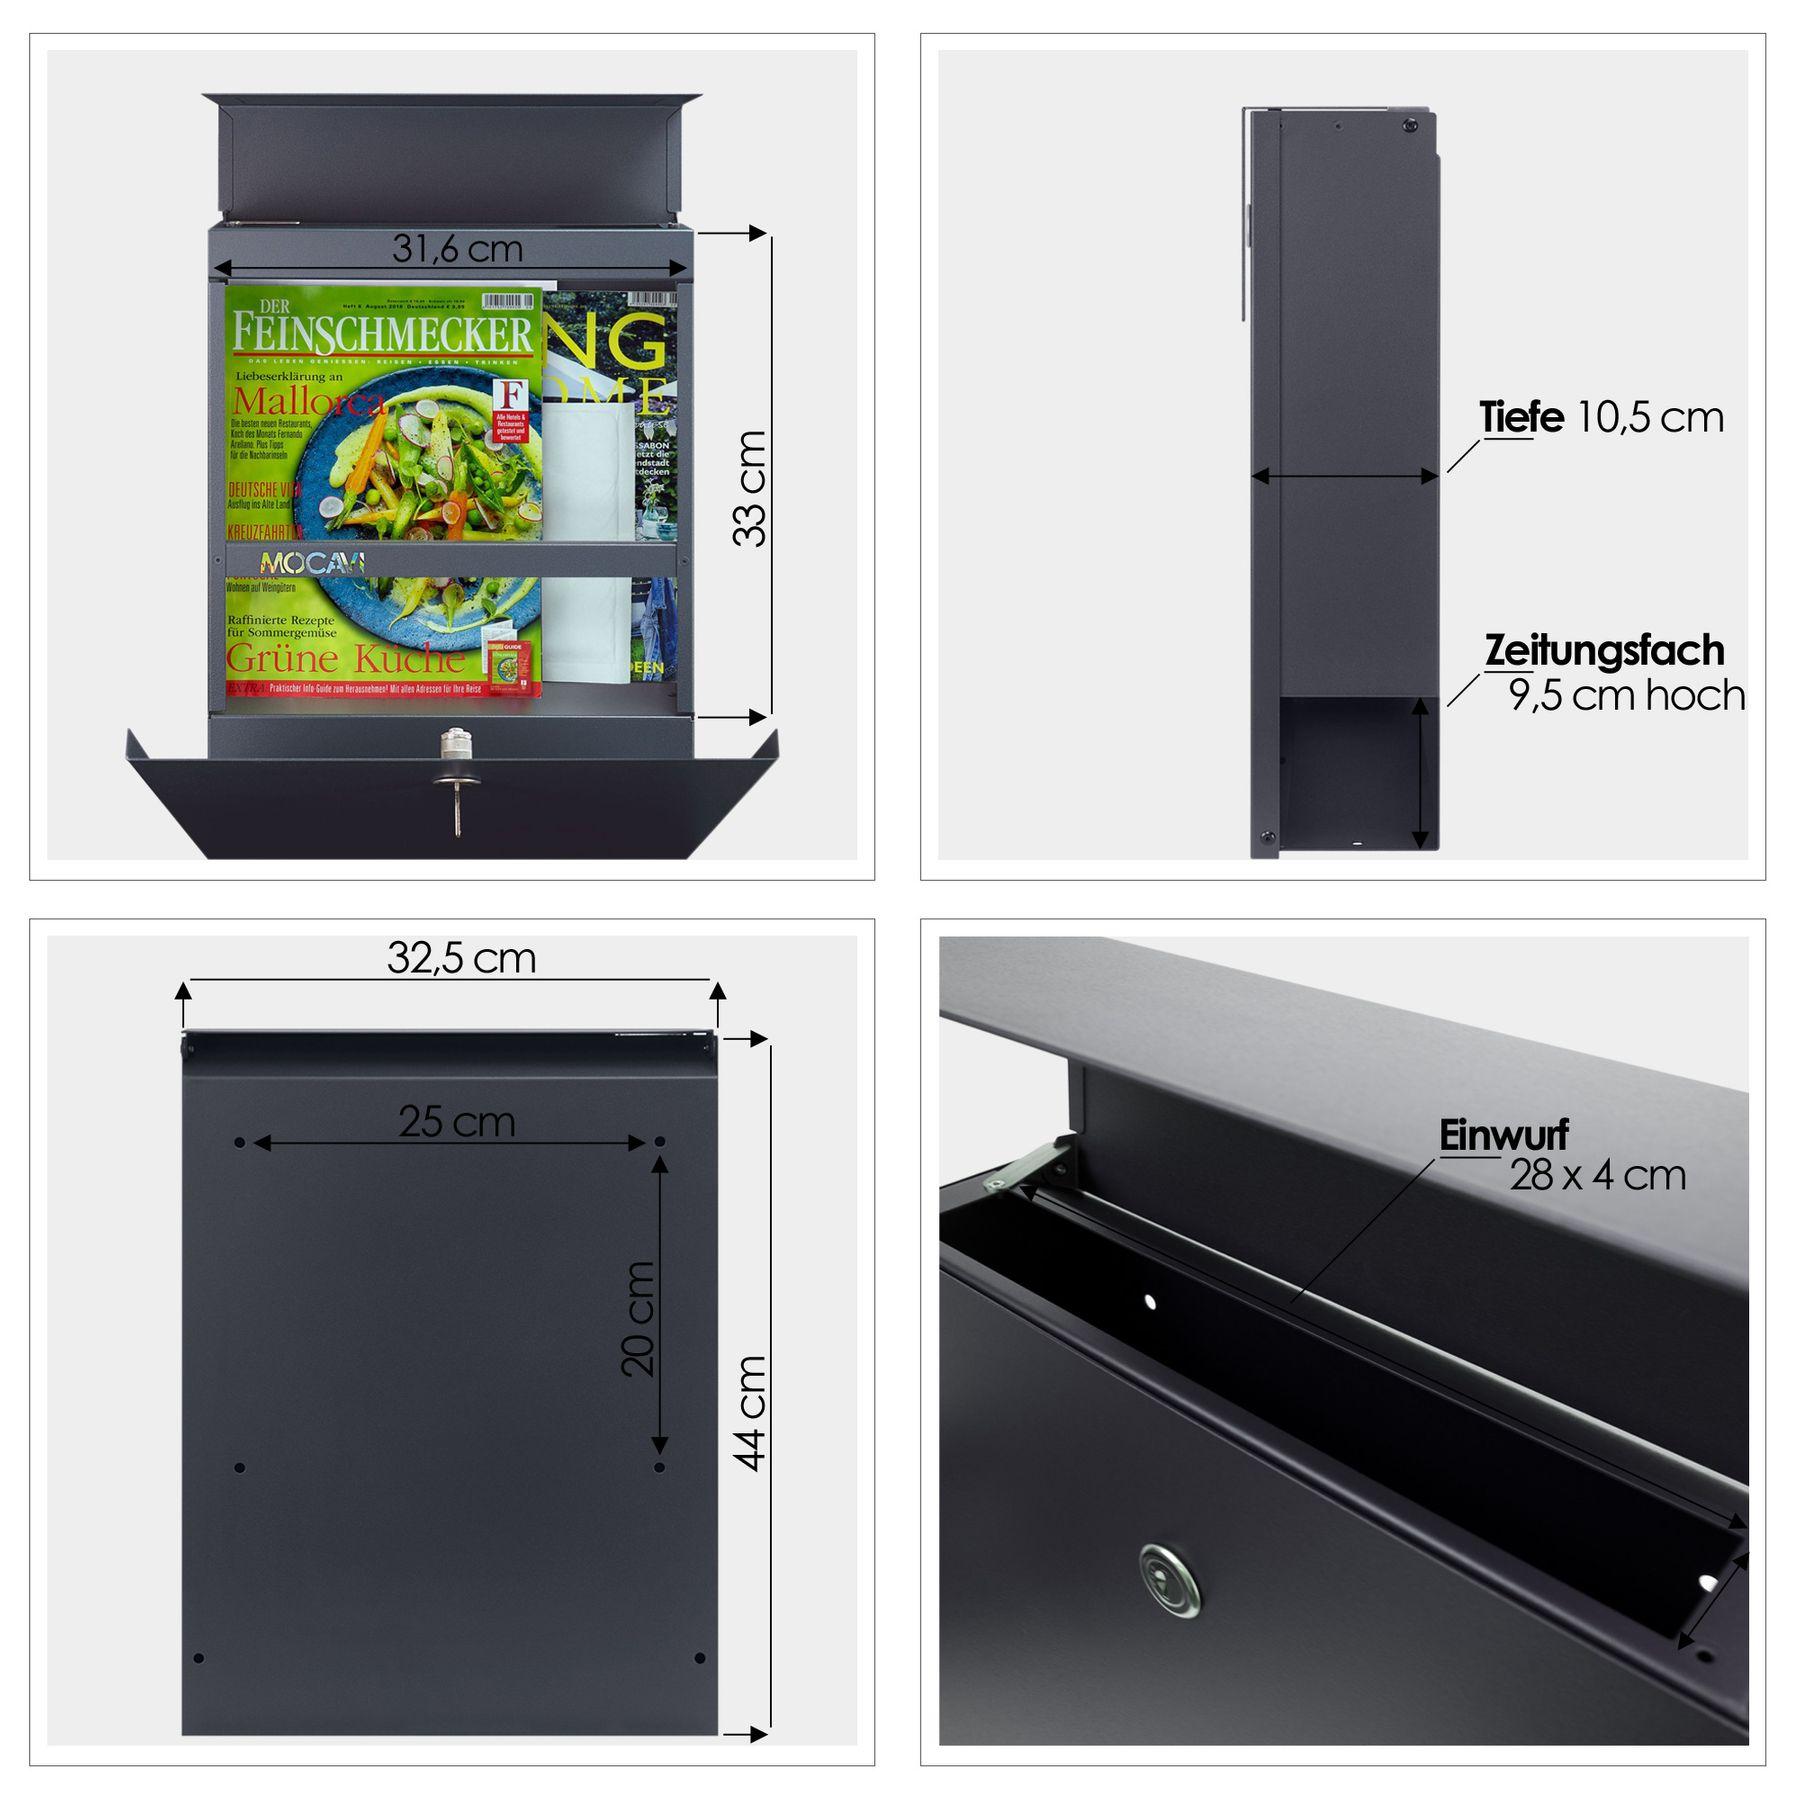 mocavi box 510 briefkasten mit gravur edelstahl anthrazit. Black Bedroom Furniture Sets. Home Design Ideas